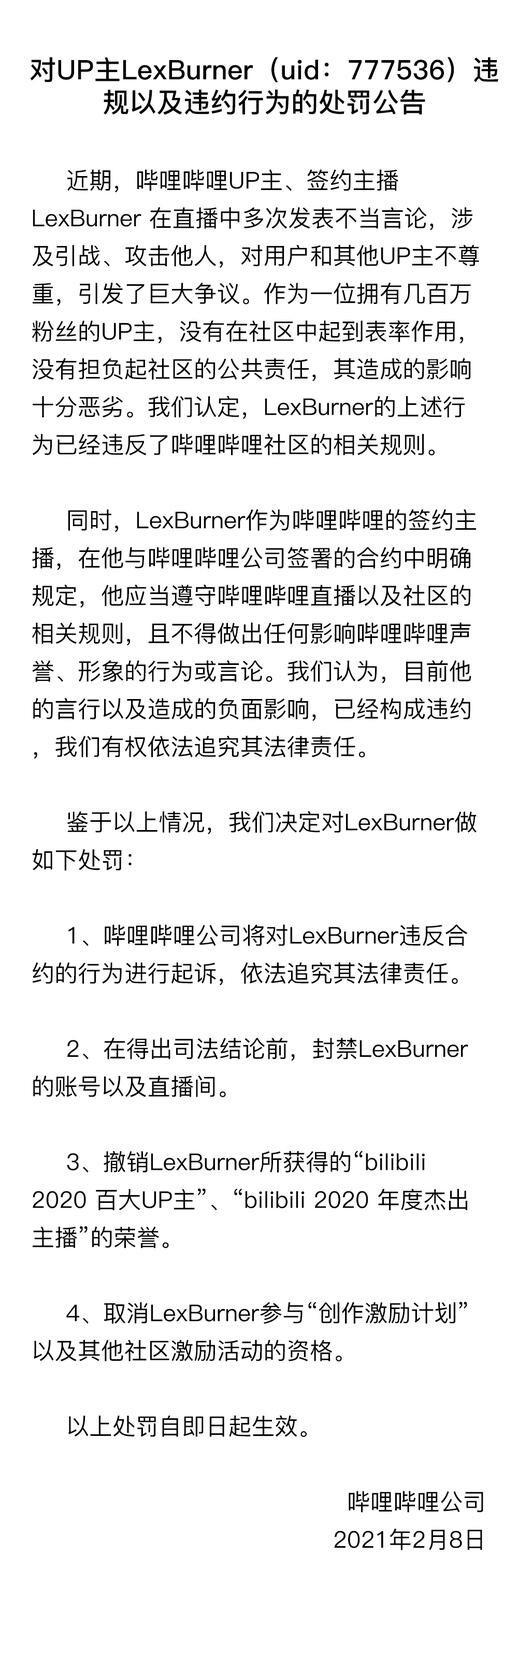 B站处罚百万粉丝UP主LexBurner,封禁账号并追究法律责任